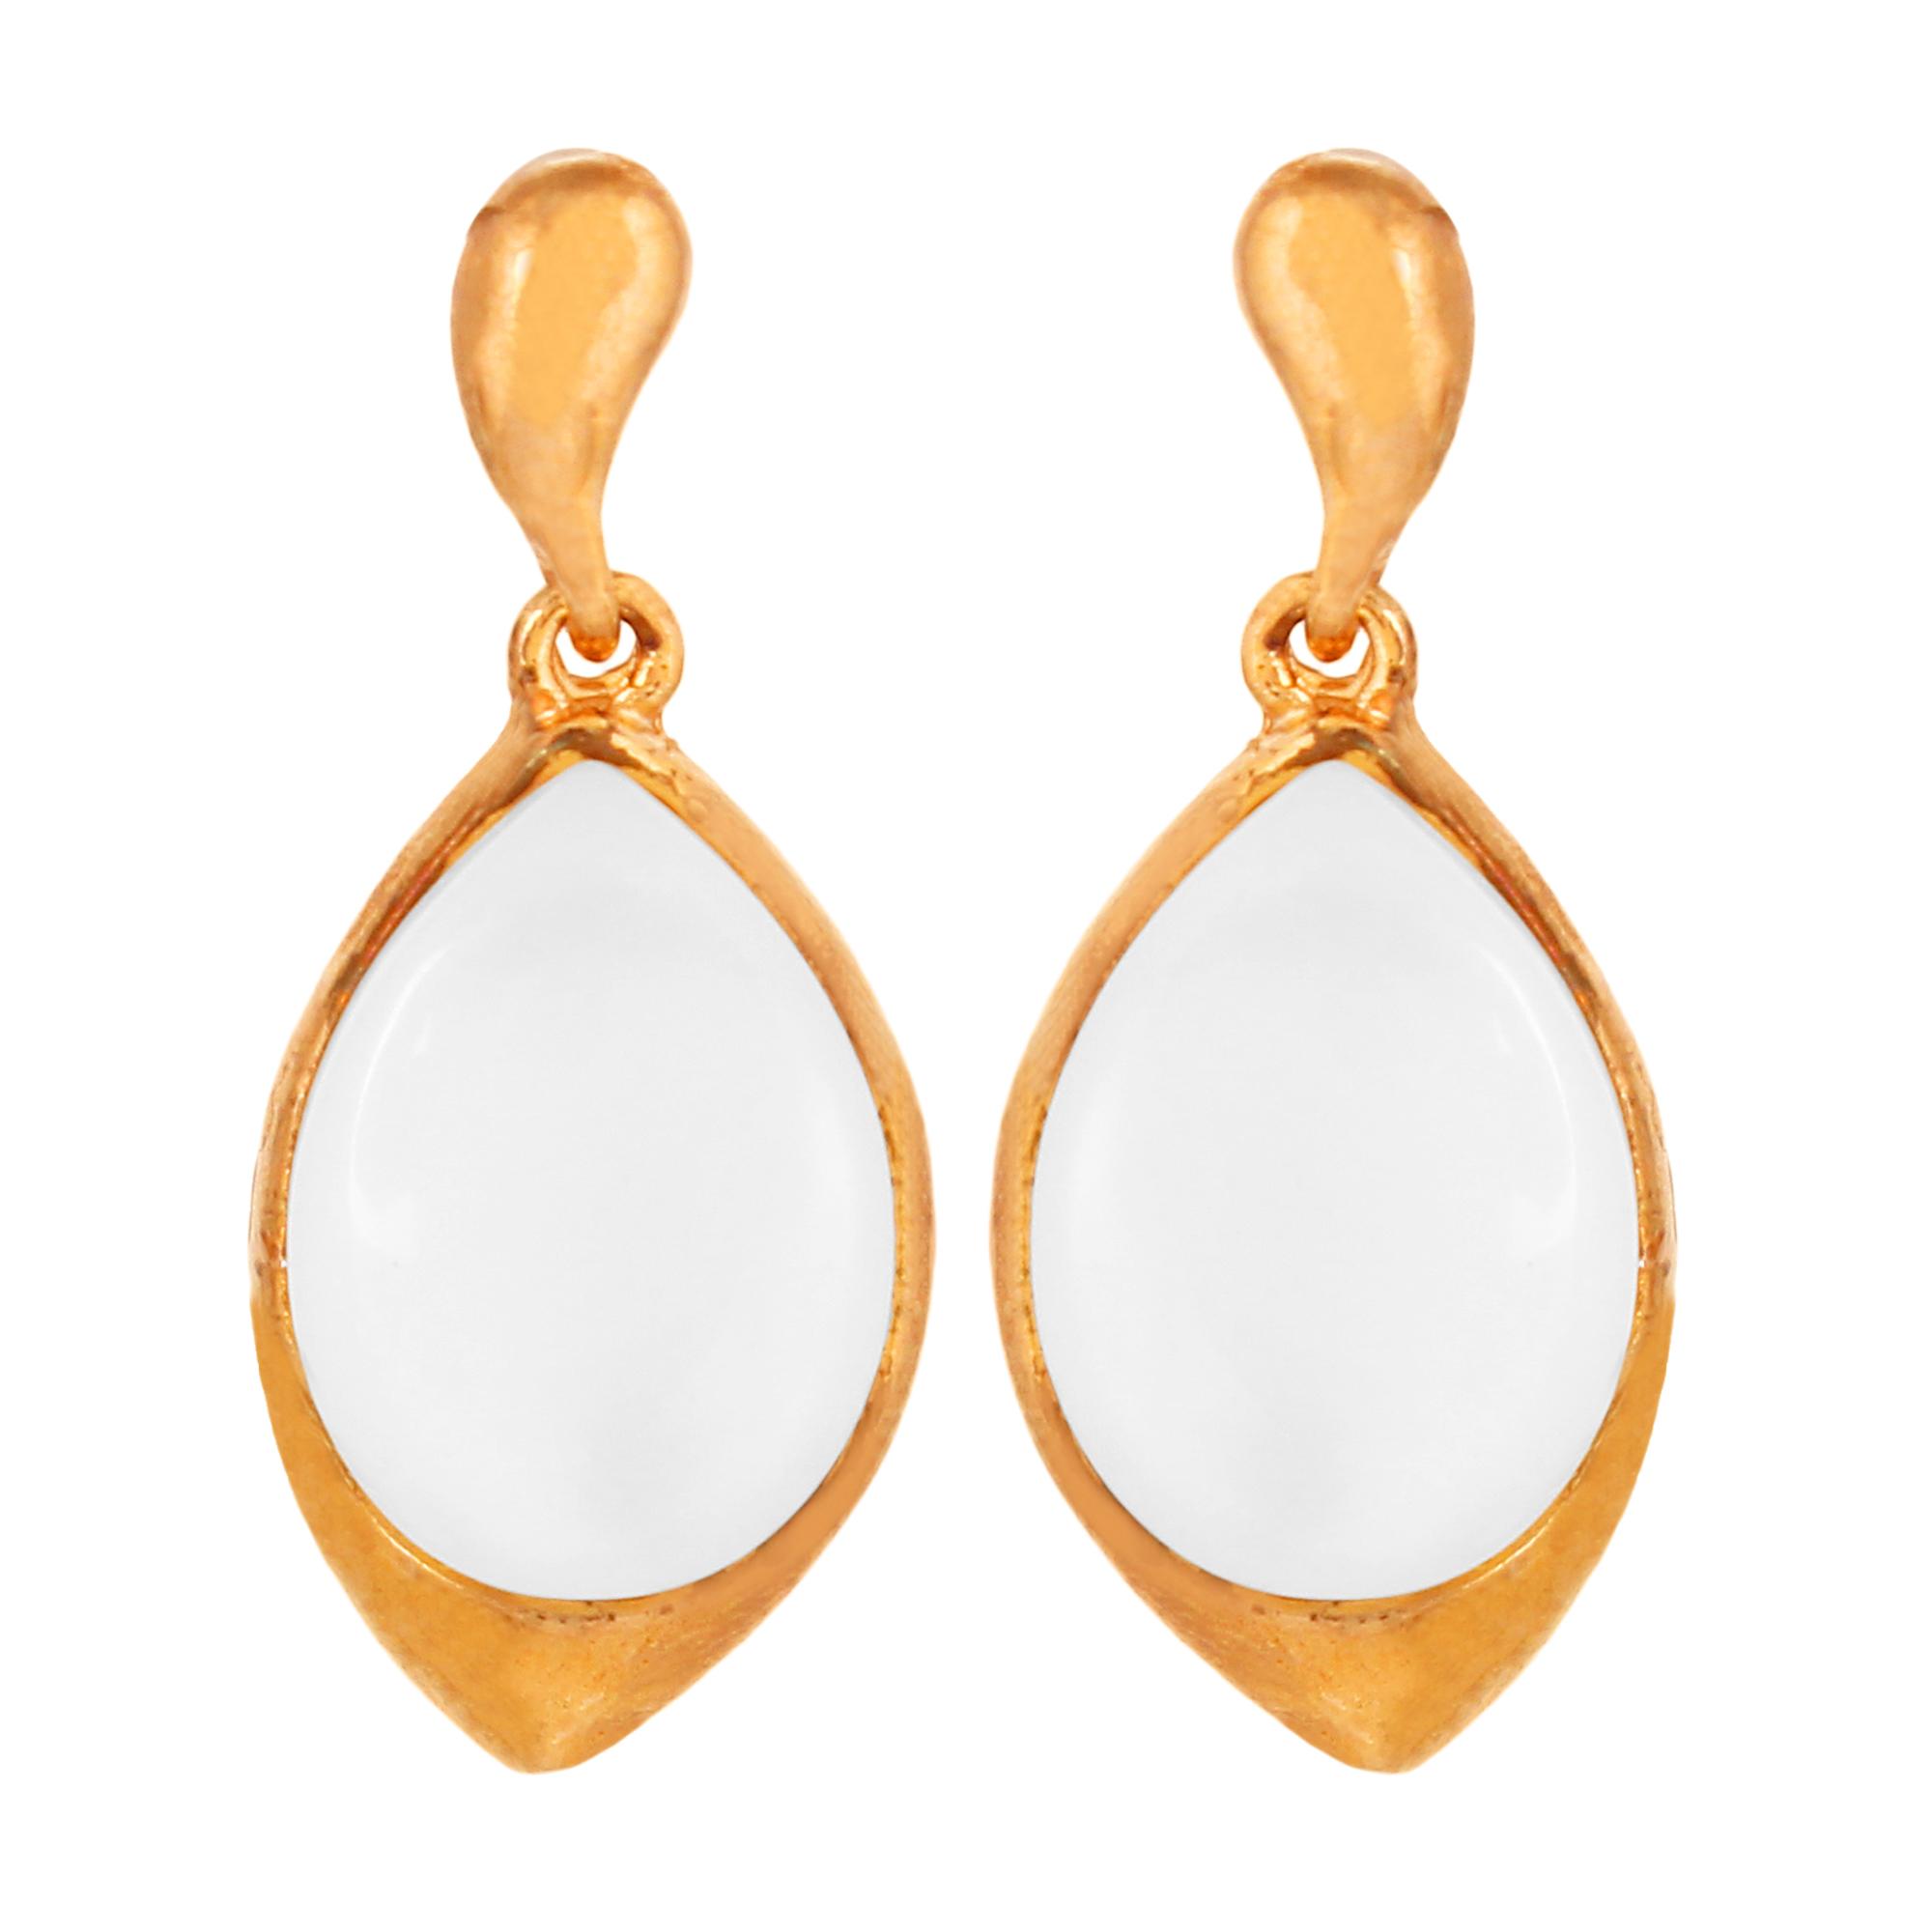 Goldnera Contemparary Design Alloy Stud Earring For Girls/Women/Kids